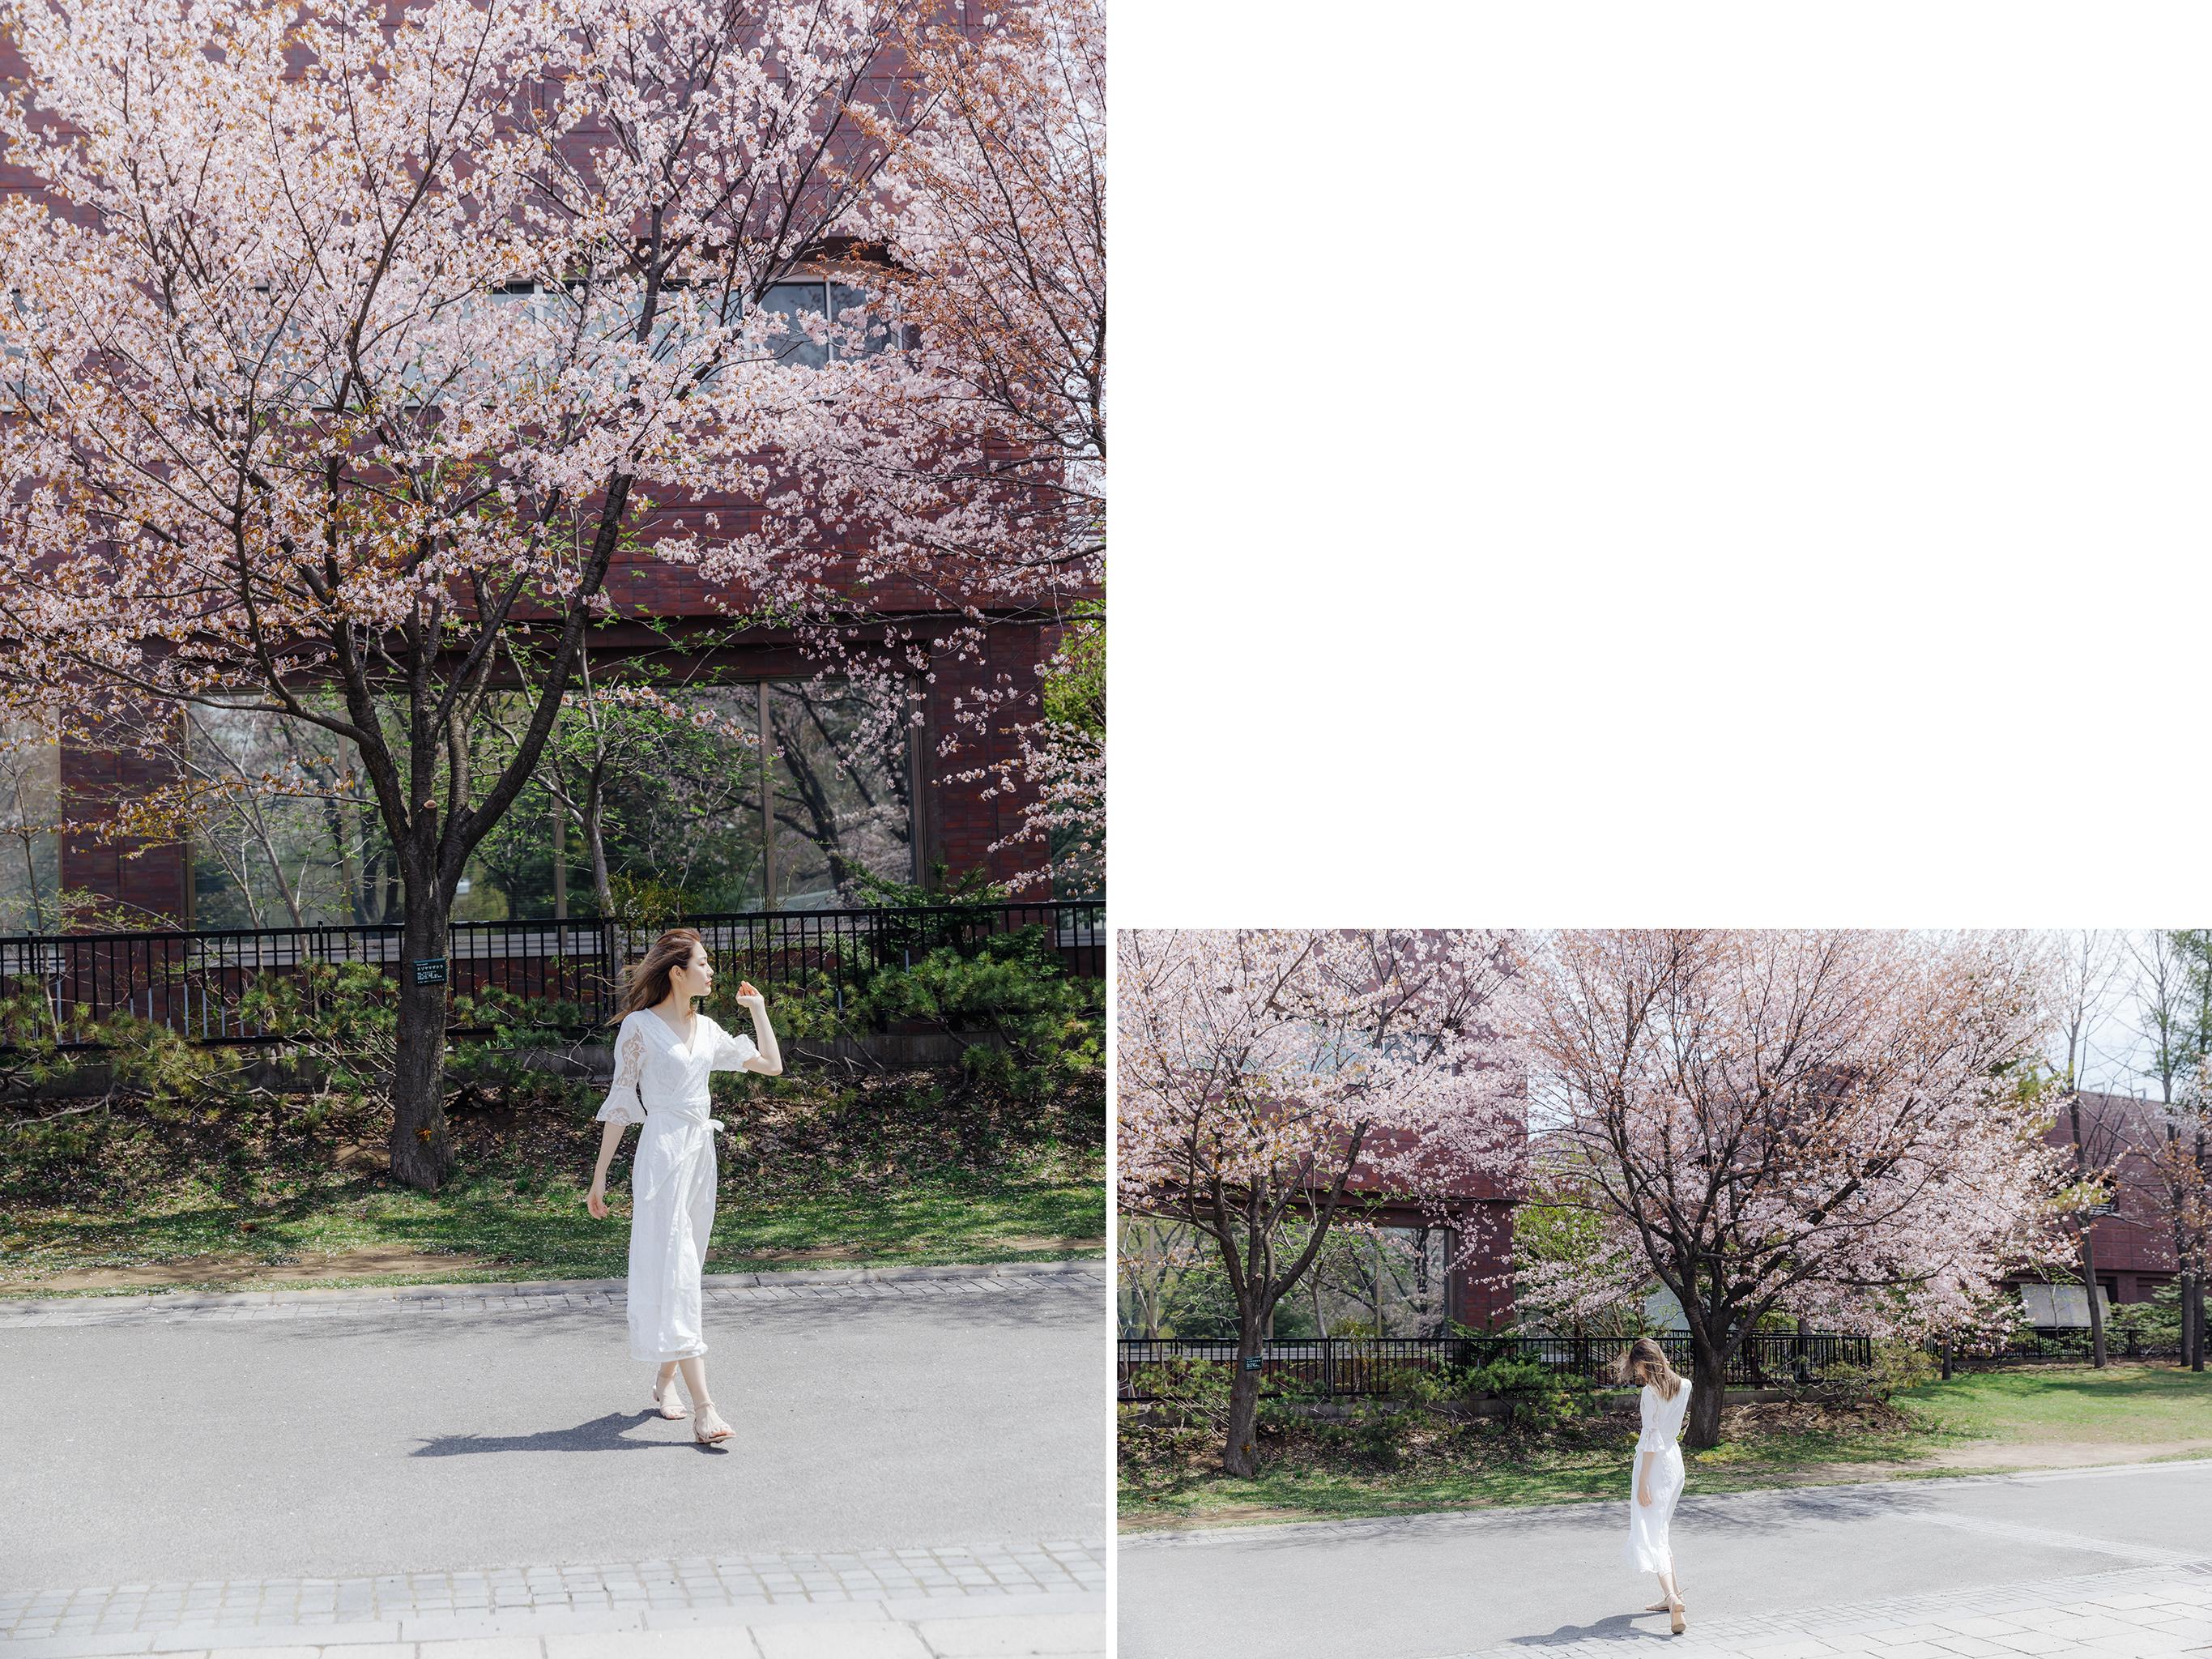 48313839387 0e7f6bf2c8 o - 【海外寫真】+2019櫻の時+